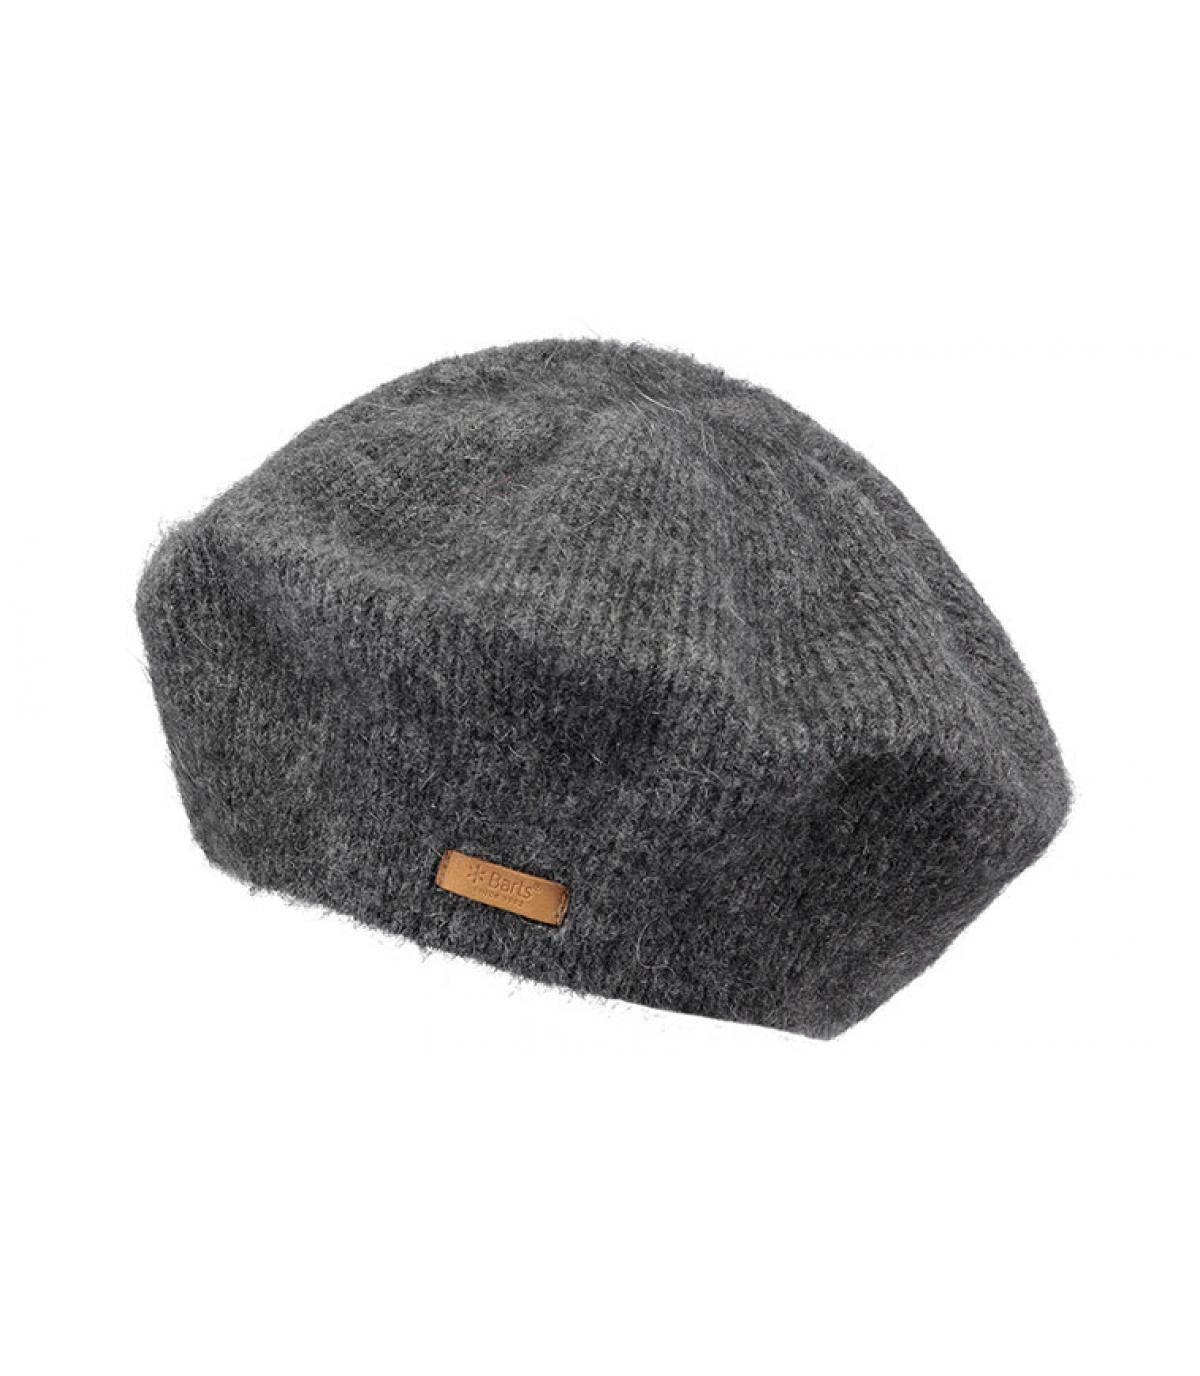 946d0534 women beret grey Barts - Eileen Beret dark heather by Barts. Headict